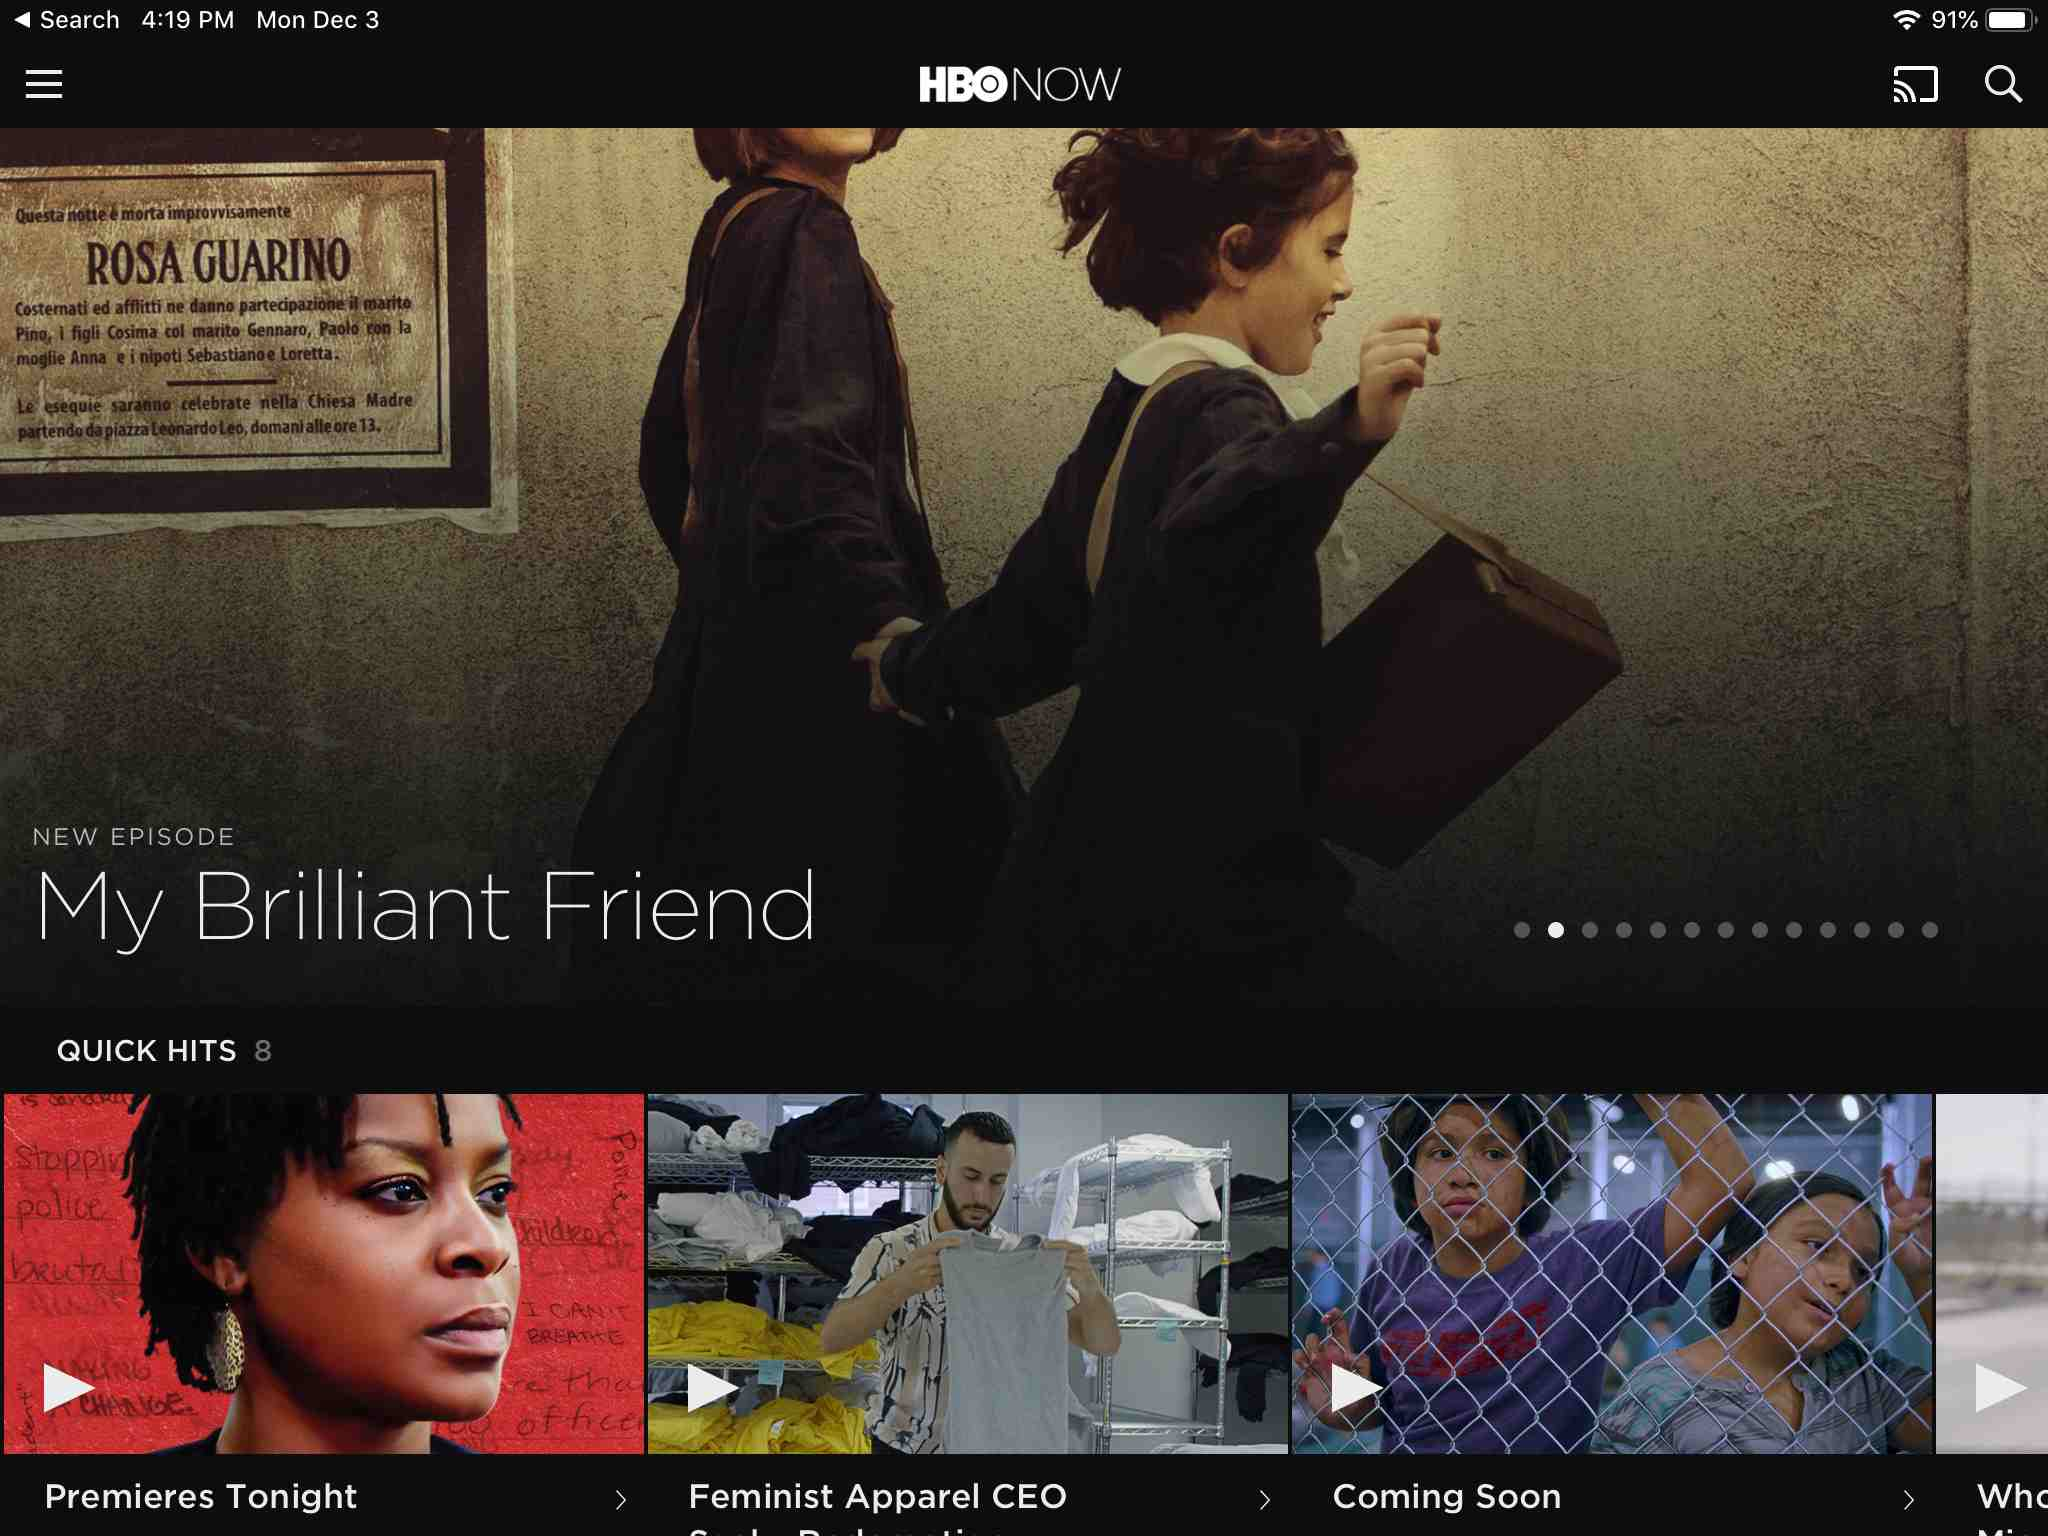 HBO Now app on iPad